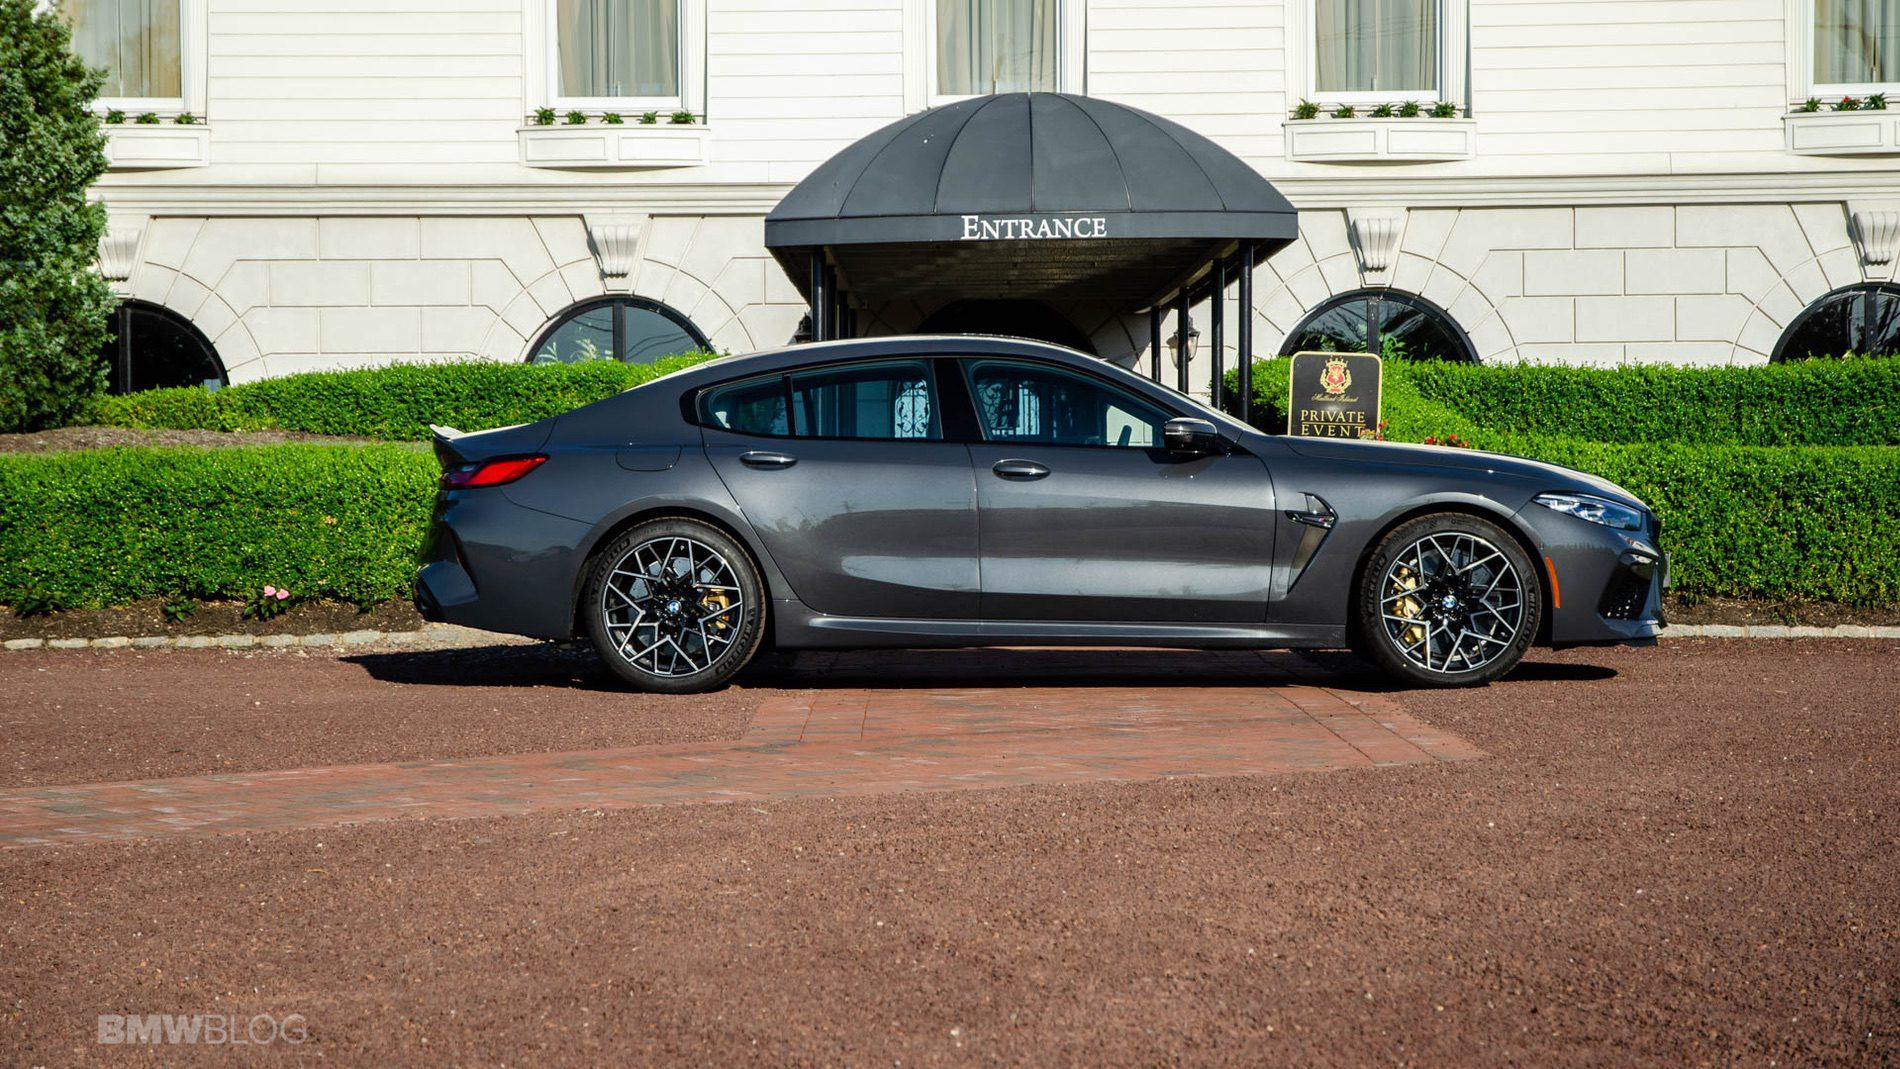 2021 BMW M8 Gran Coupe test drive 03